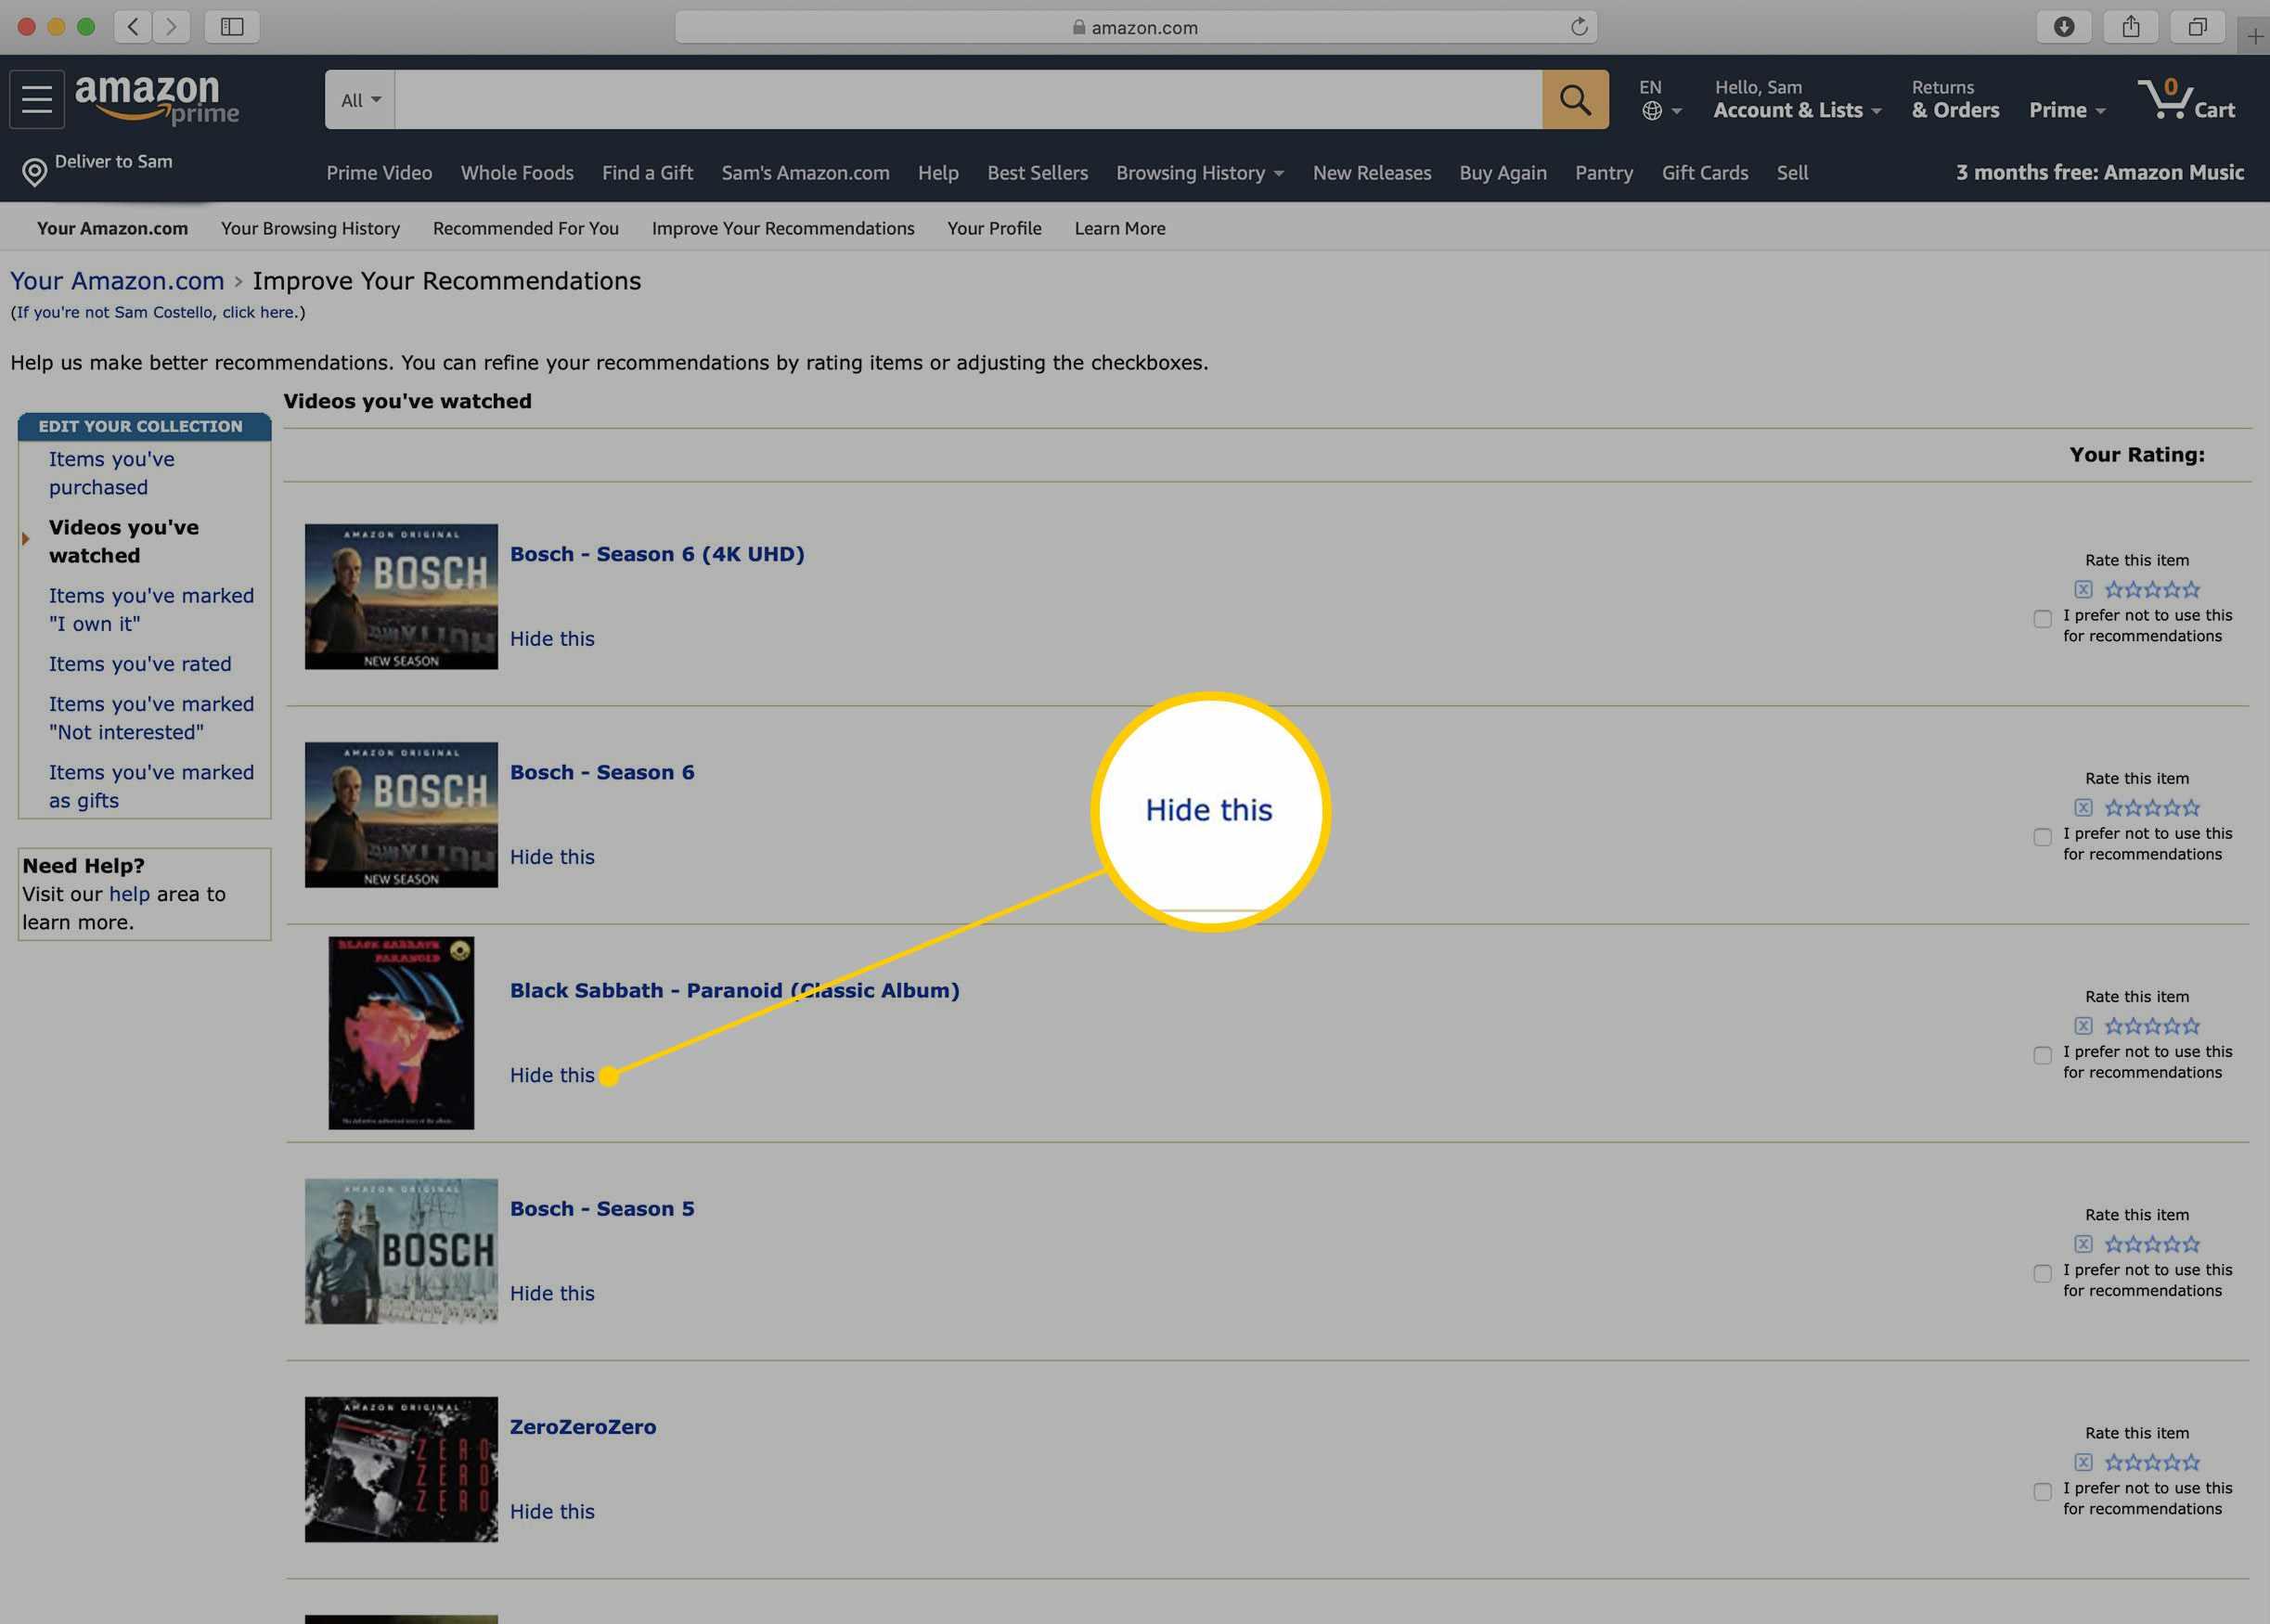 Amazon Prime Video Watch History list